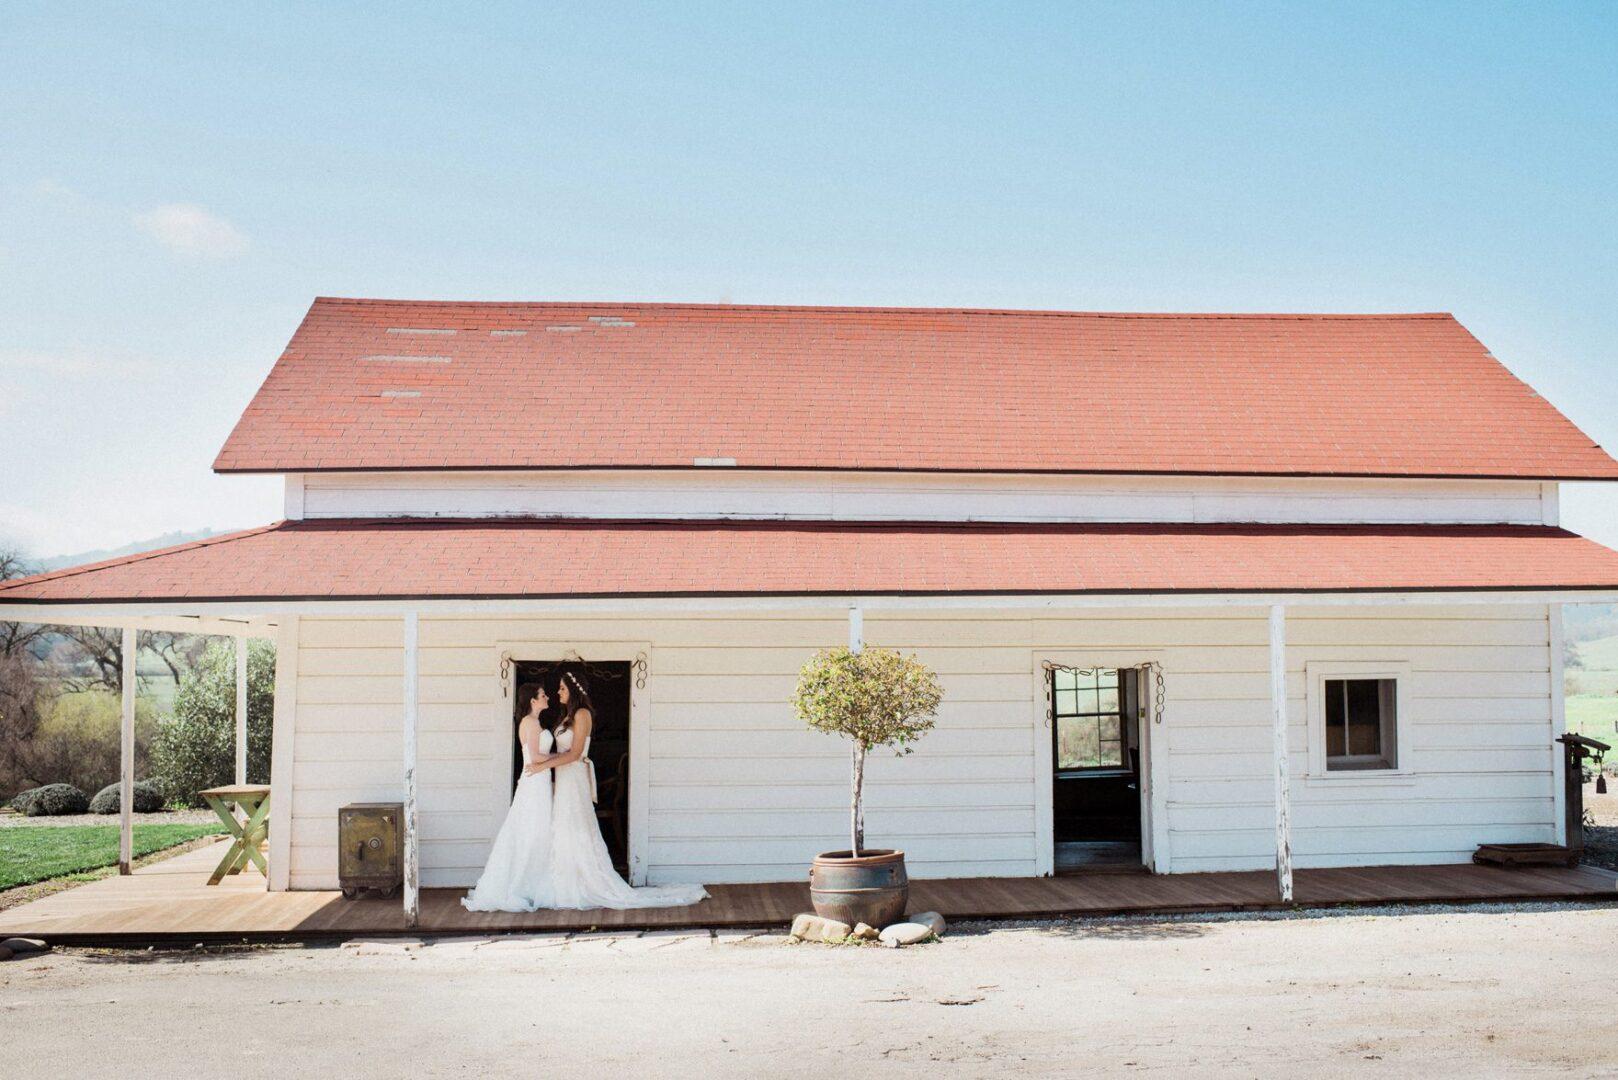 California-Santa-Margarita-Ranch-destination--Saint-Louis-Obispo-wedding-photographer-christina-lilly-photography020